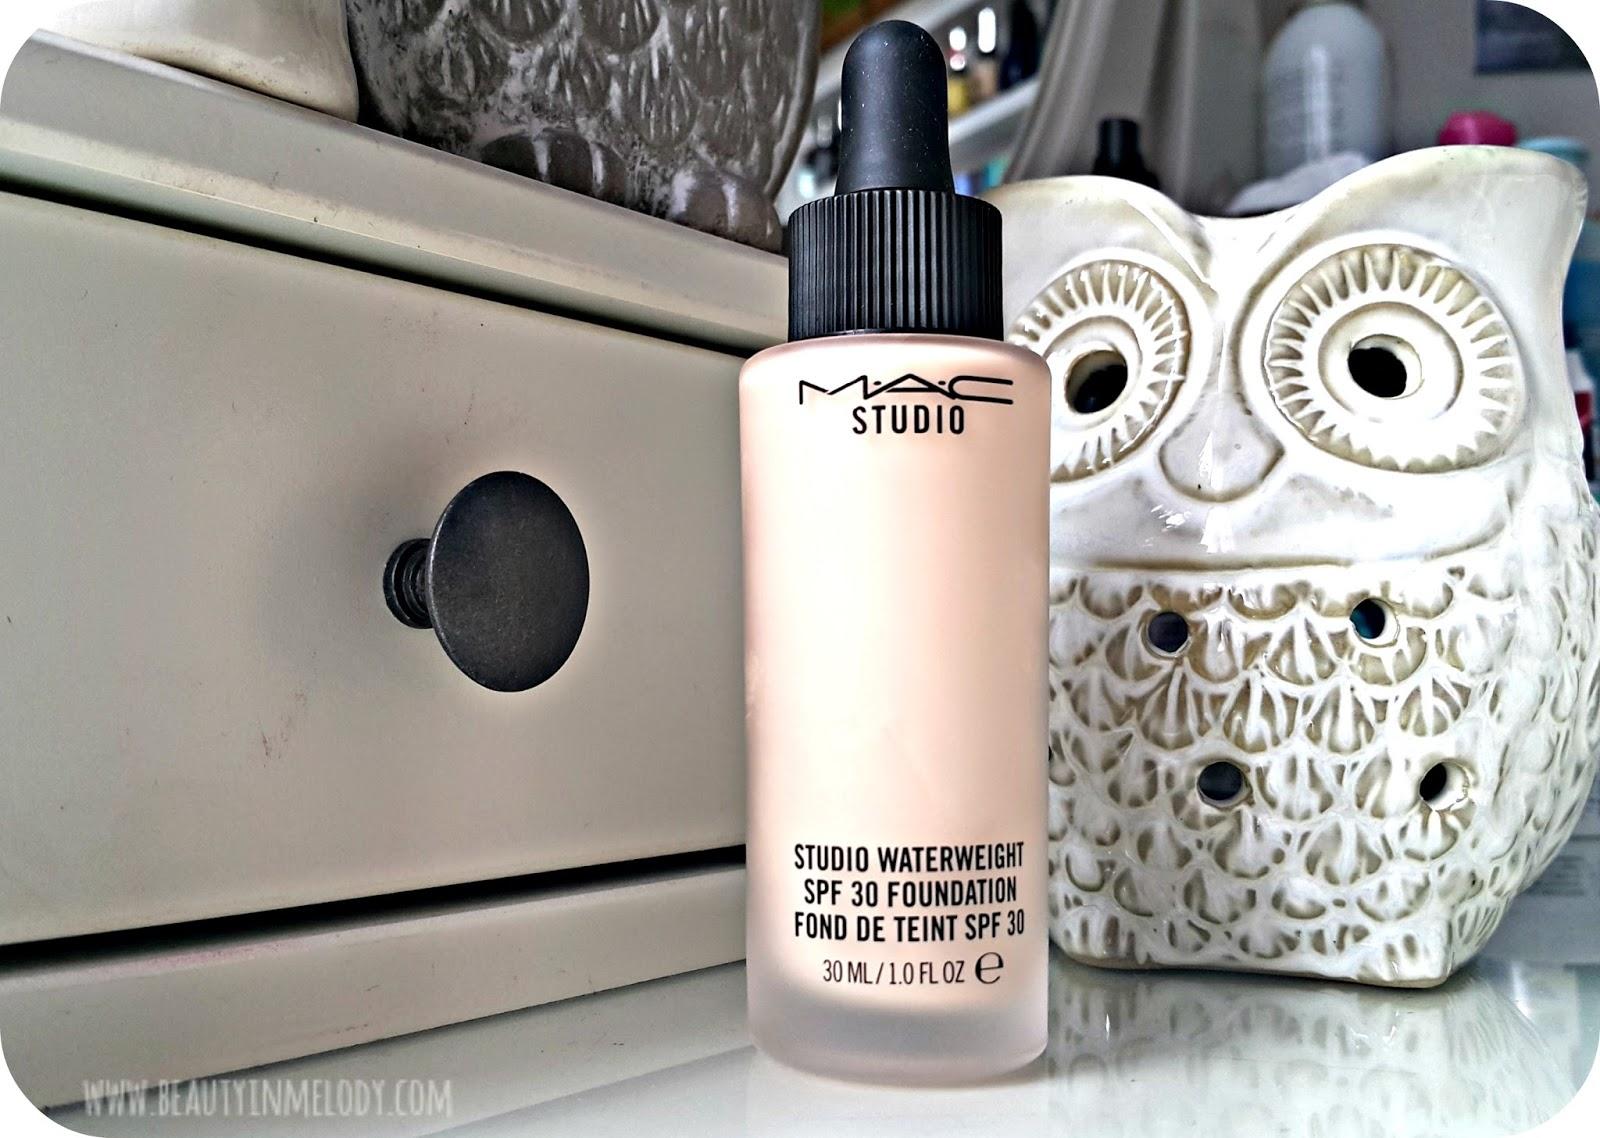 Beauty&Melody: Review: MAC - Studio Waterweight SPF30 Foundation